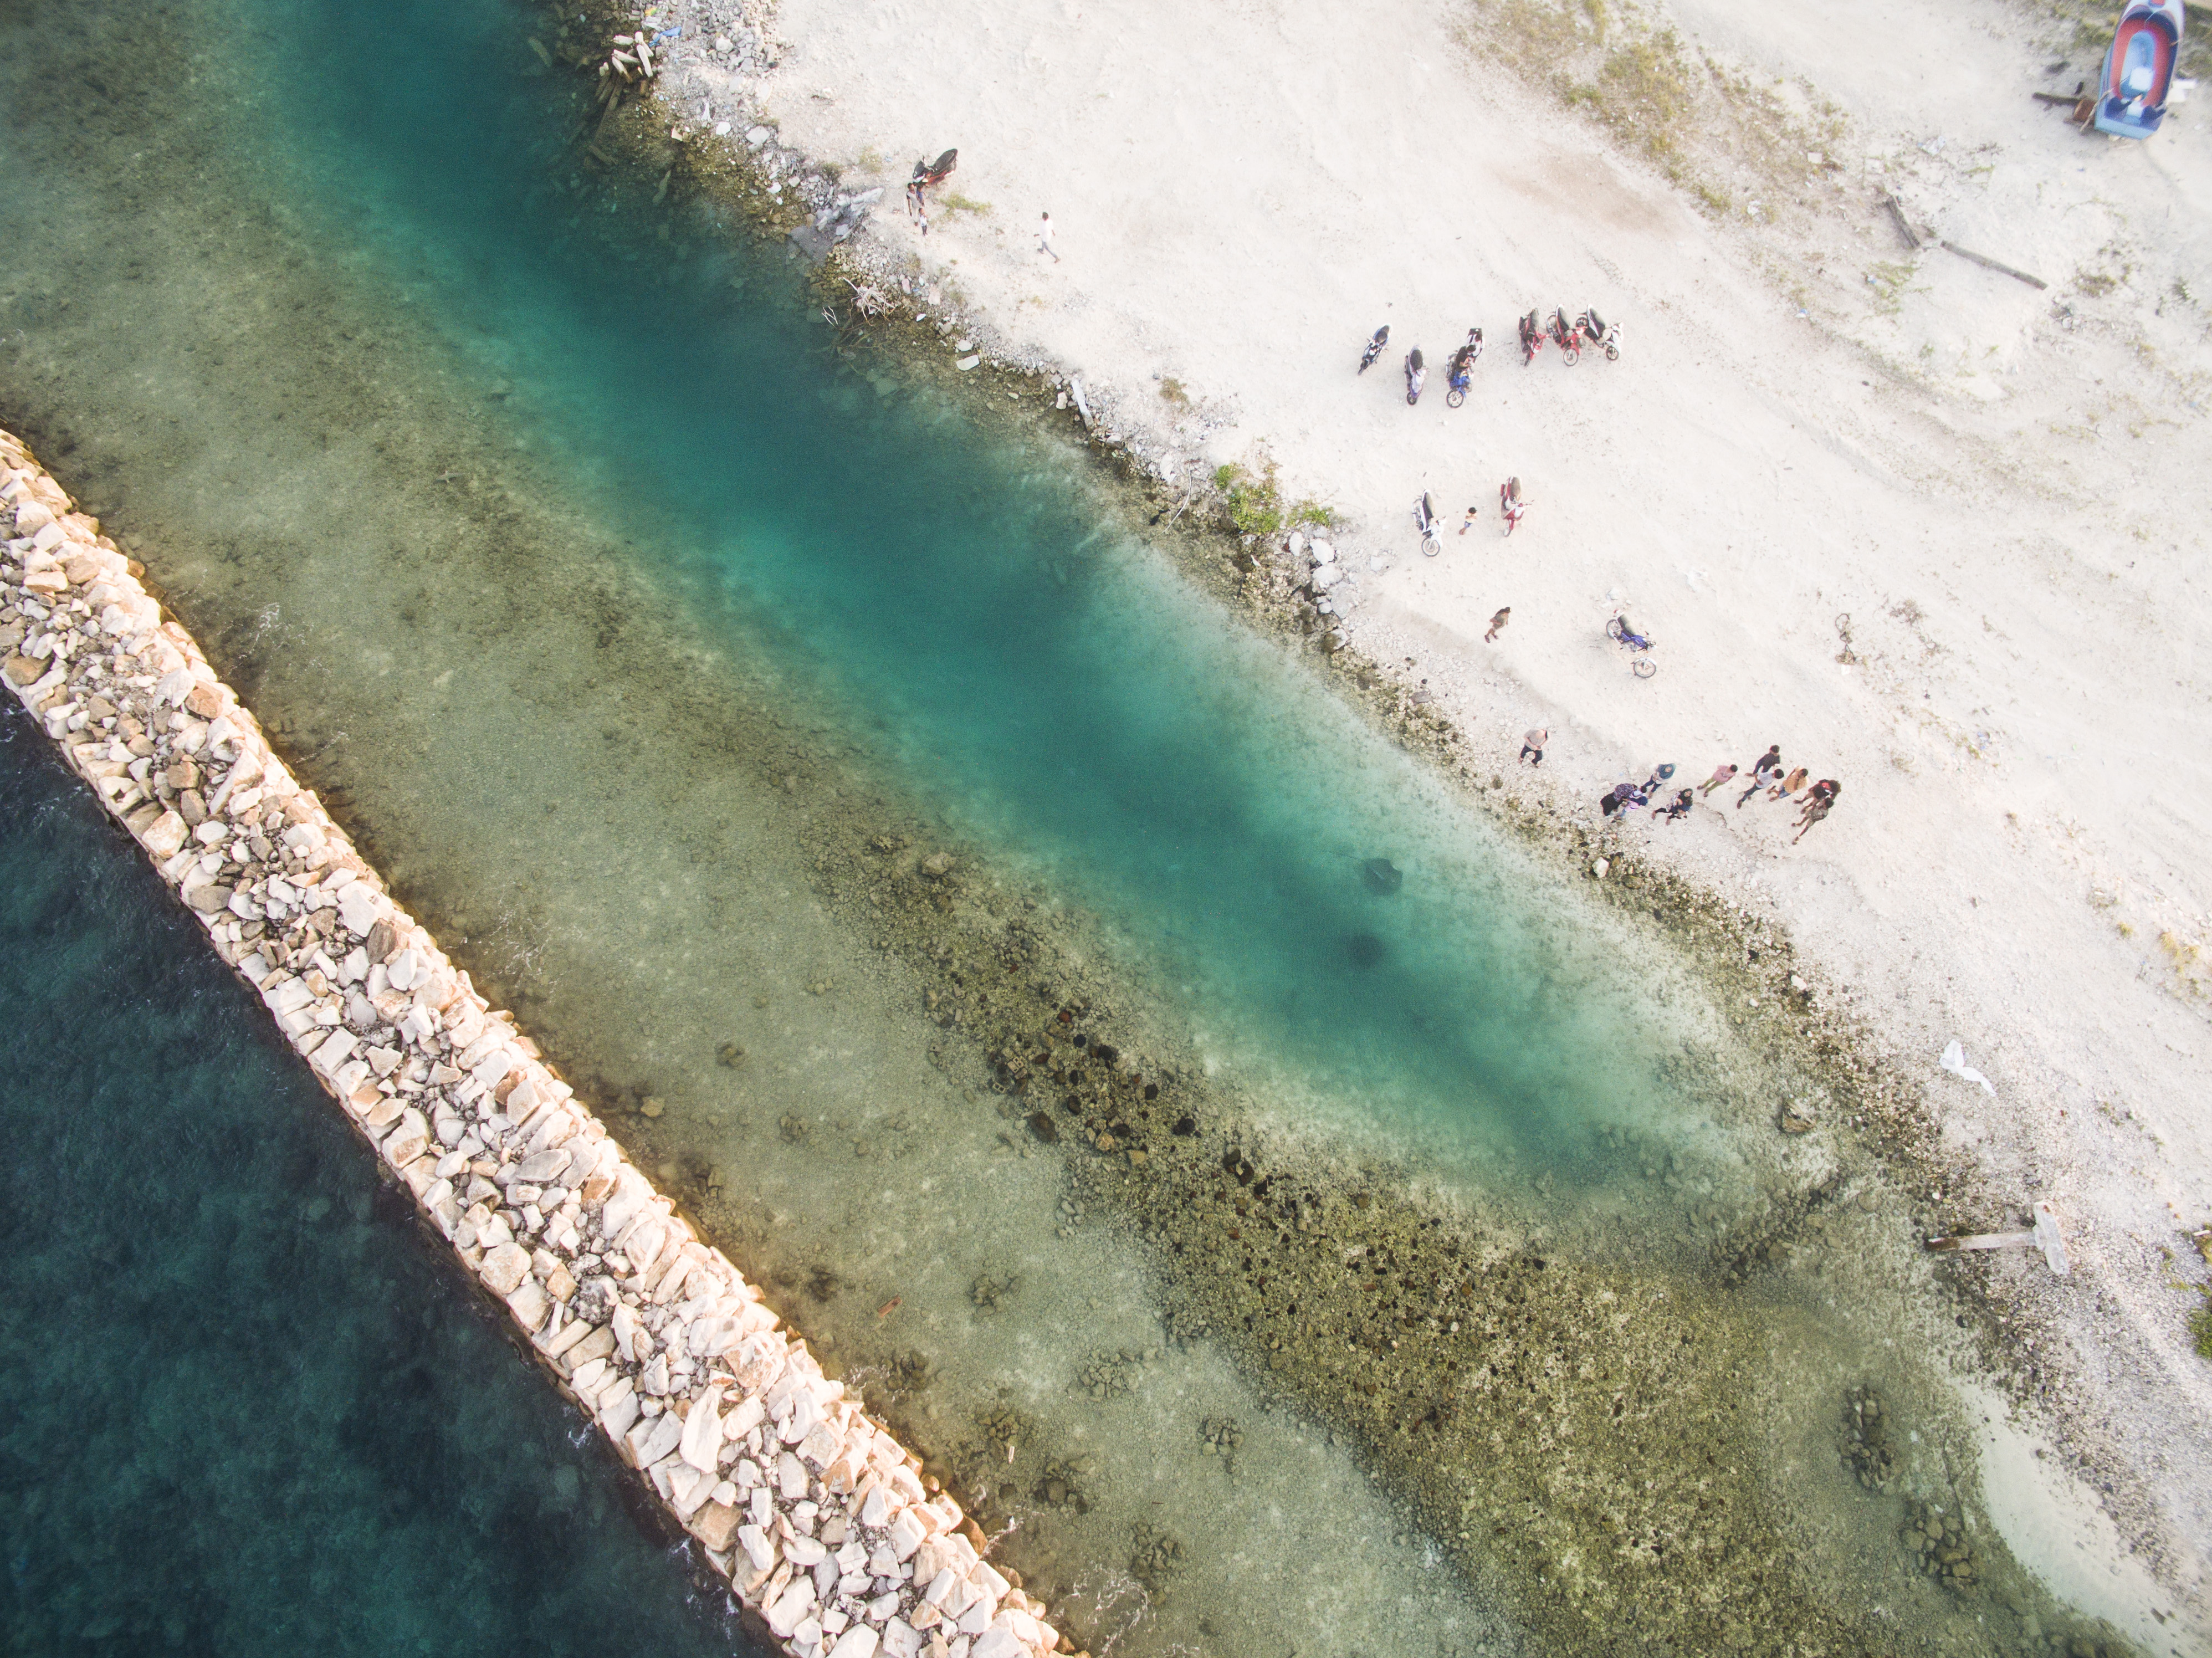 Lacabana Maldives  A Dh Maamigili Island (5)